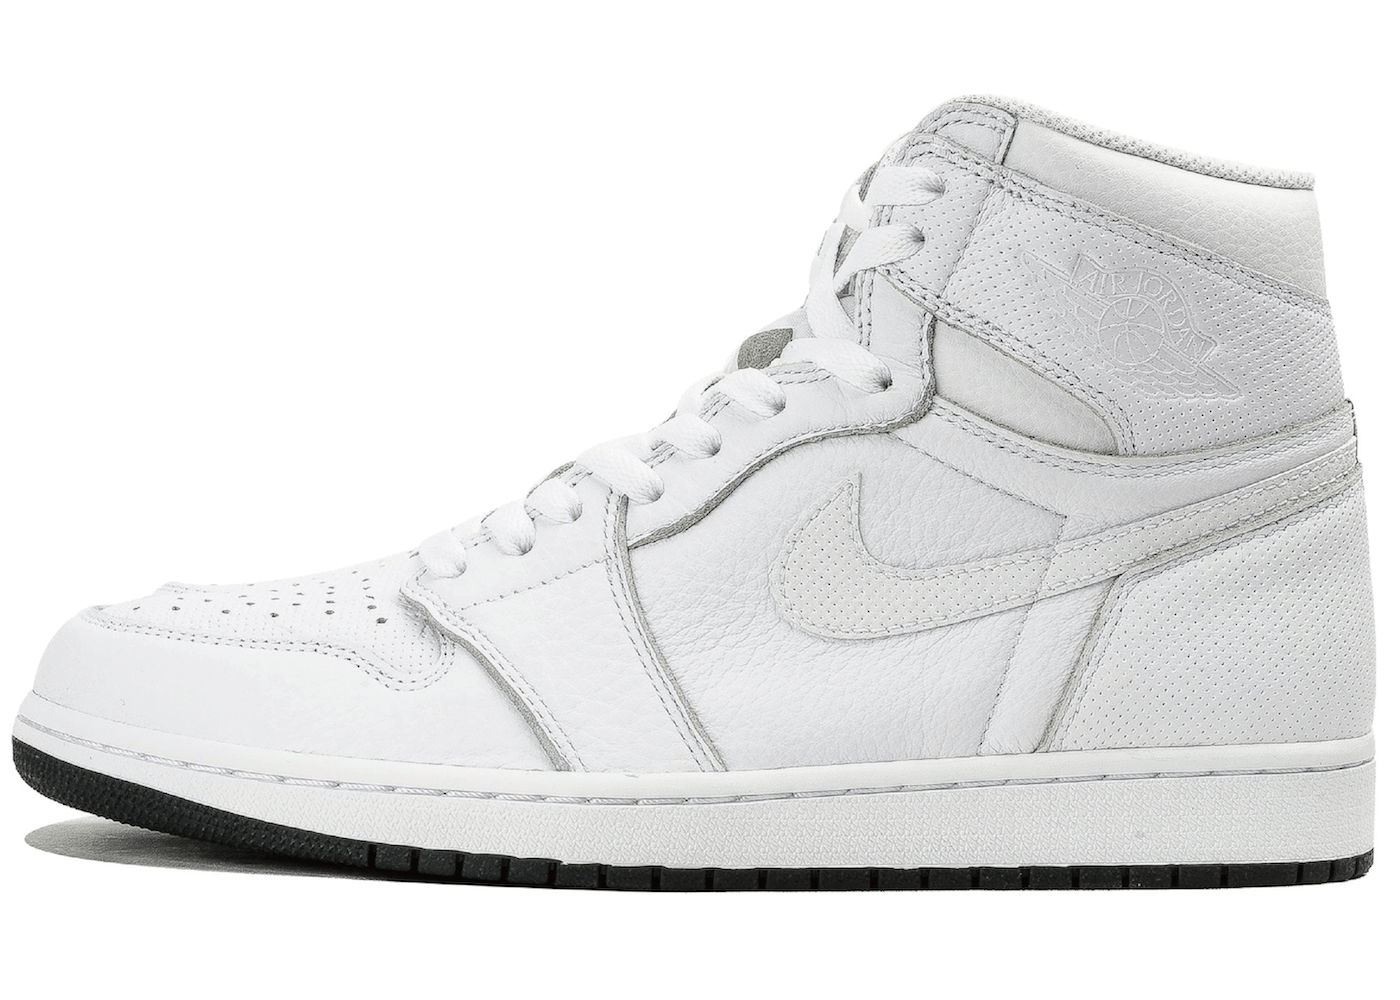 Jordan 1 Retro White Perforatedの写真